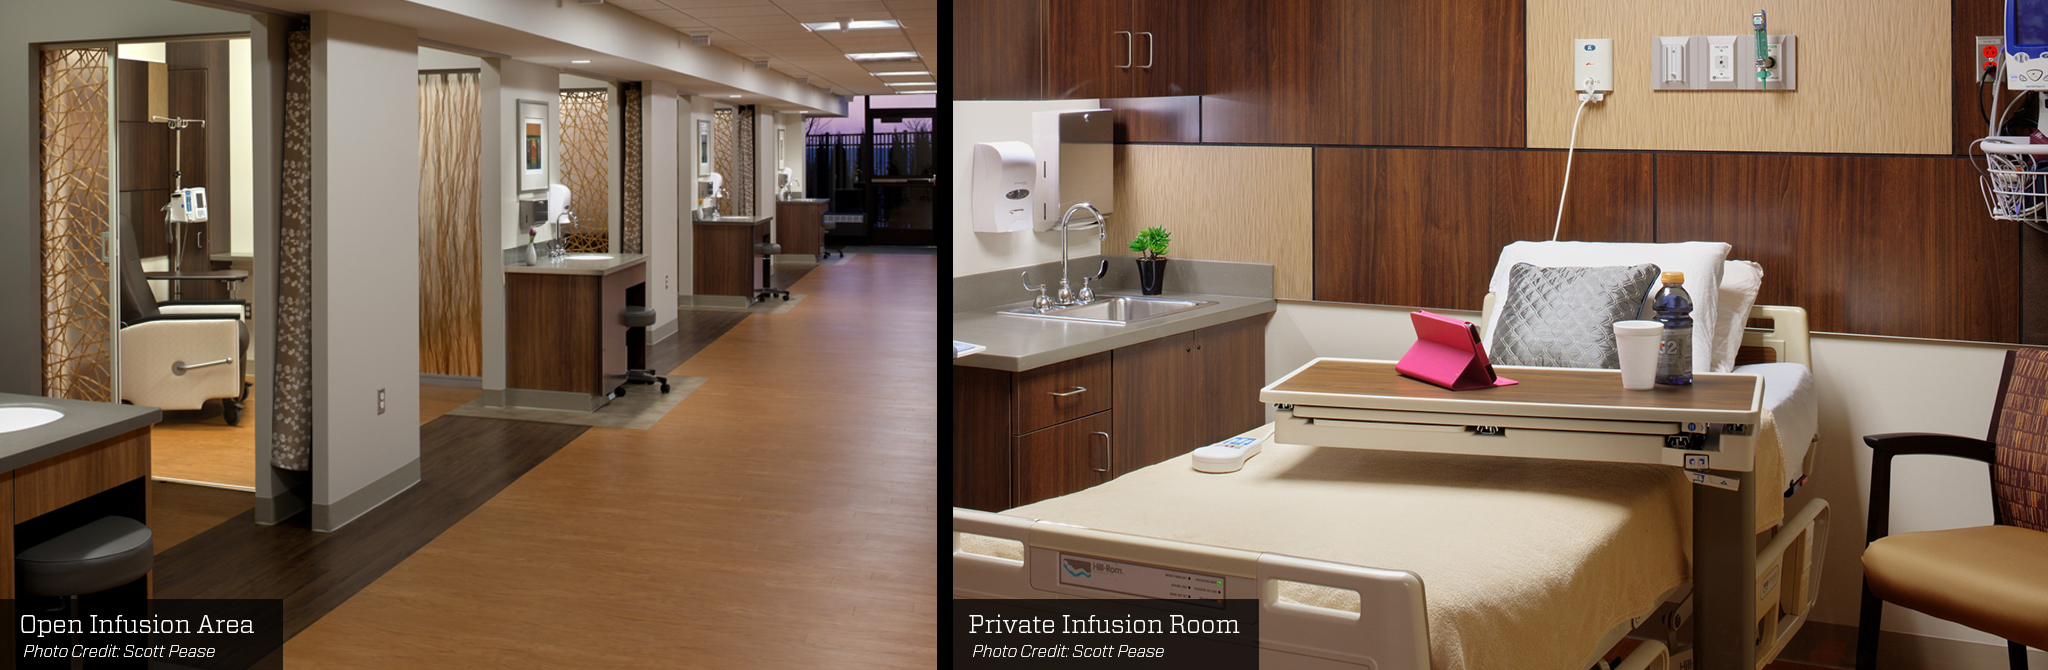 infusion area